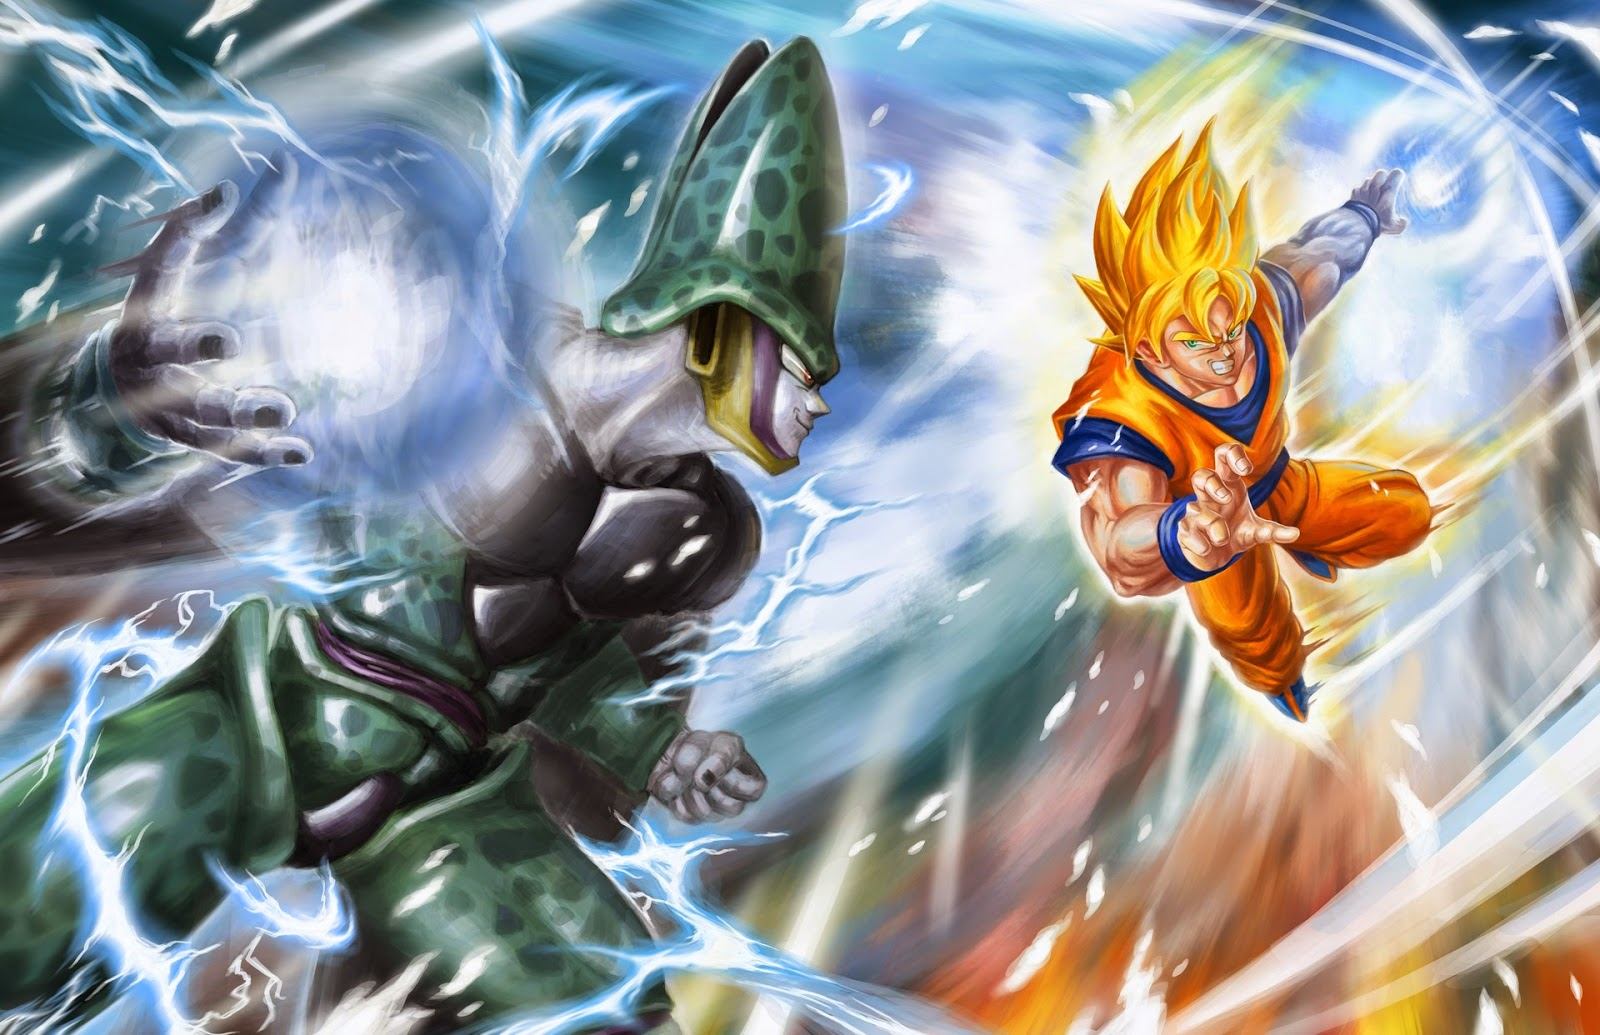 Goku vs Cell Dragon Ball Z   Fondos de Pantalla HD   Wallpapers HD 1600x1035